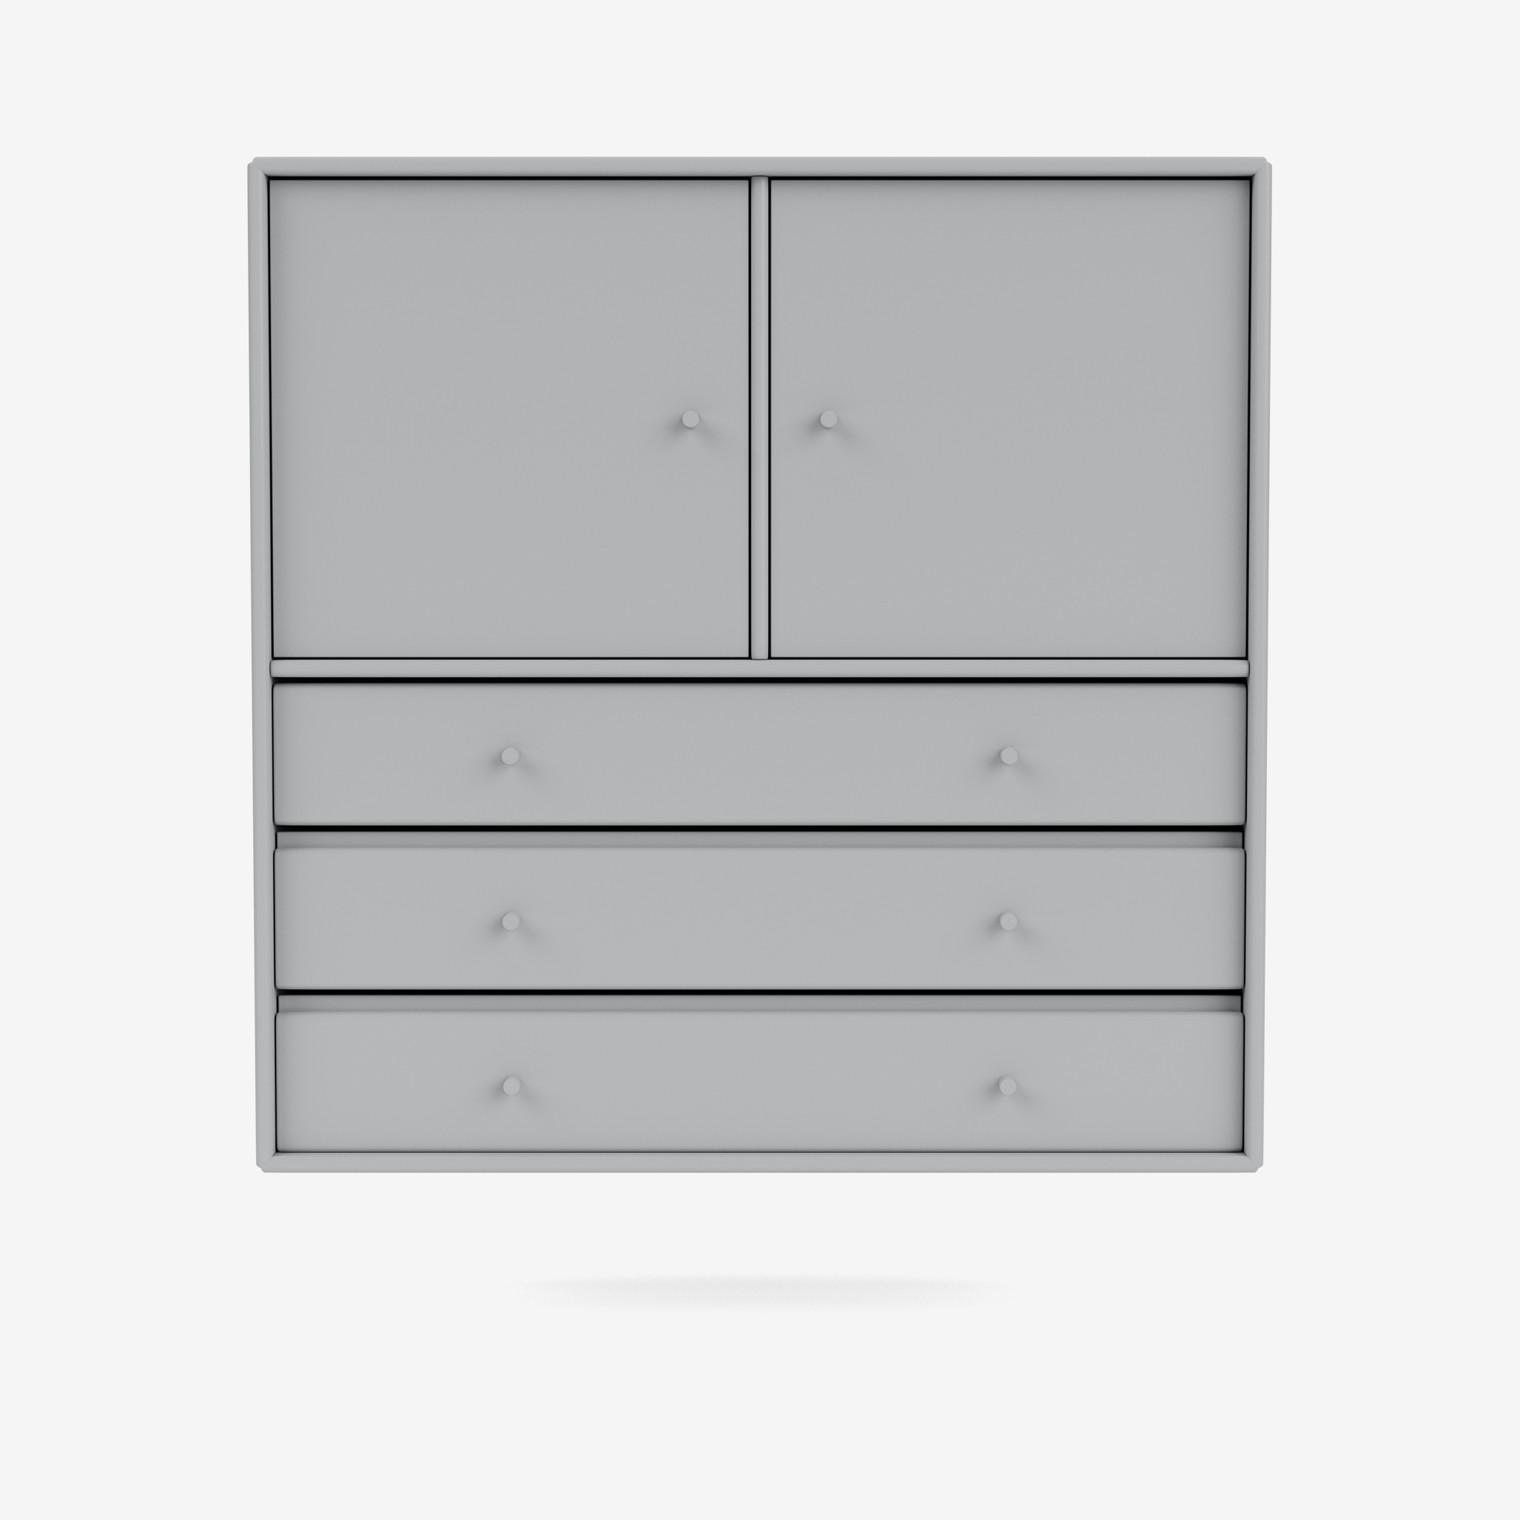 Dresser 1121